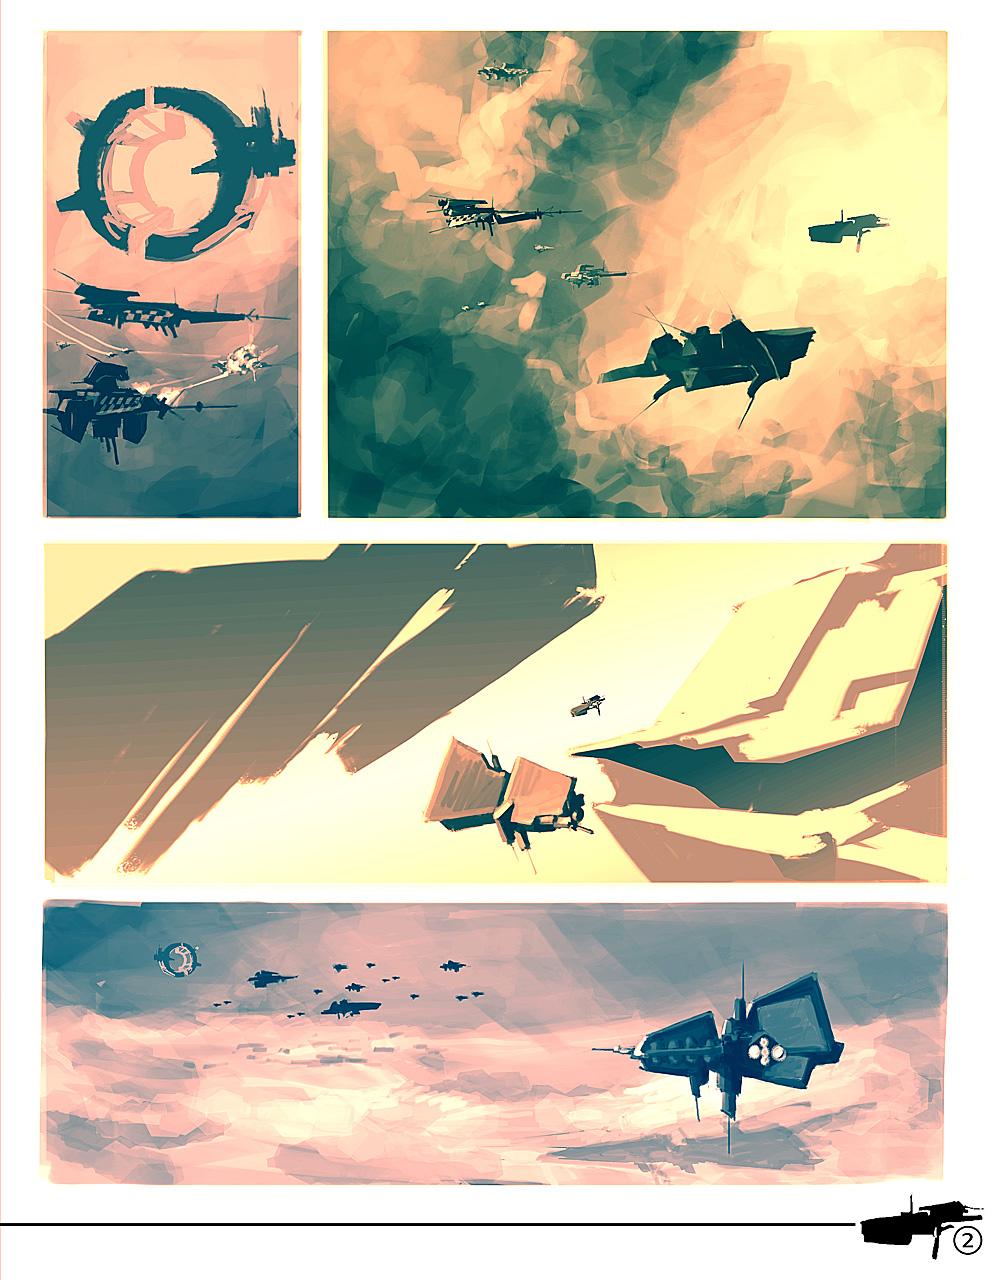 Prospector - Page 2 by Pyrosity